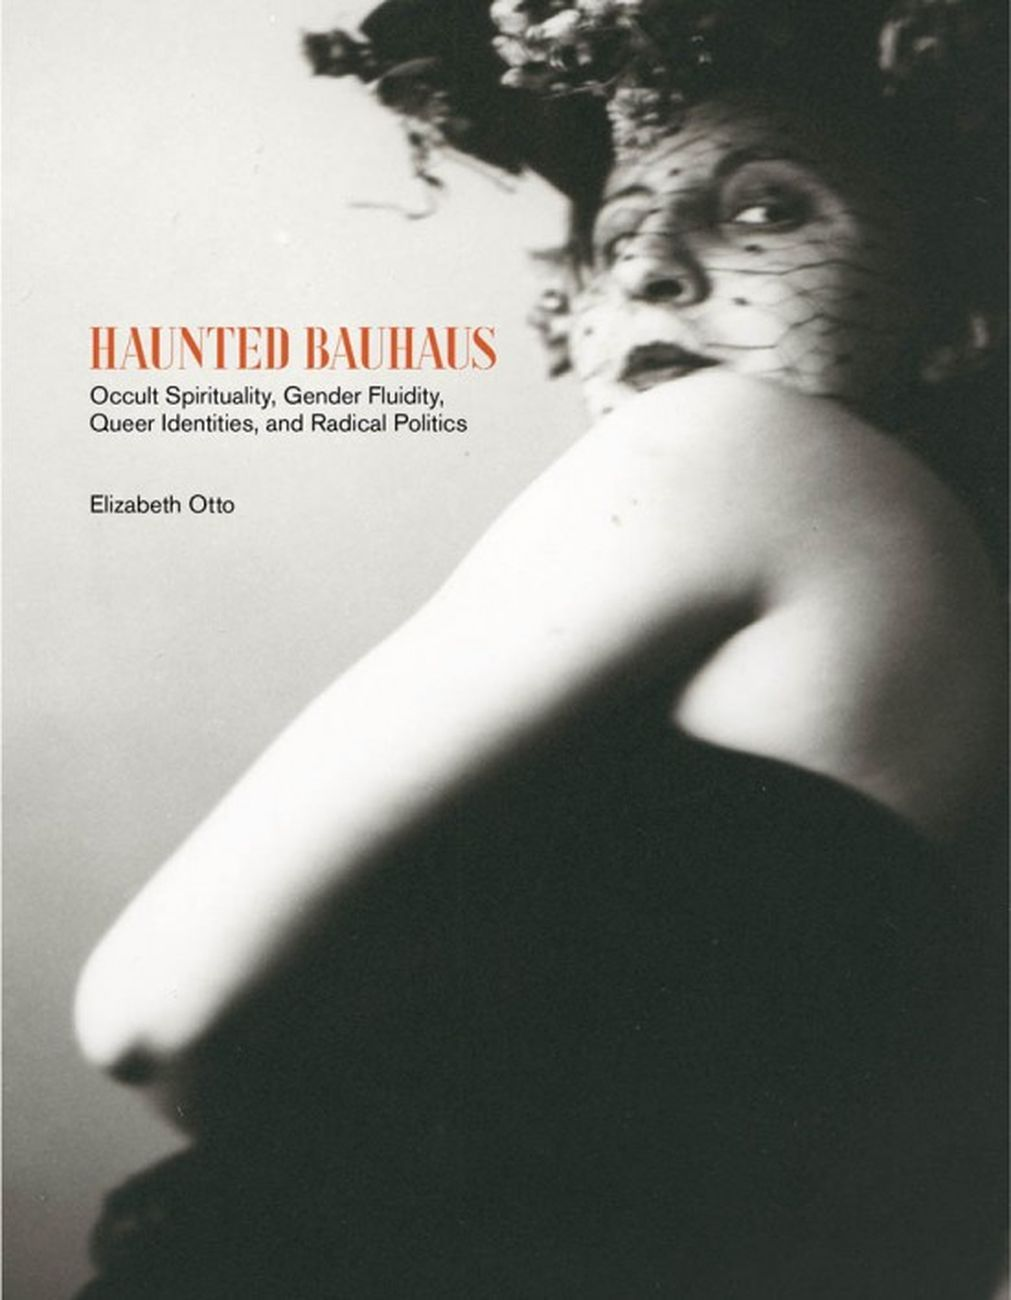 Elizabeth Otto – Haunted Bauhaus. Occult Spirituality, Gender Fluidity, Queer Identities, and Radical Politics (The MIT Press, Cambridge [Mass.] 2020)